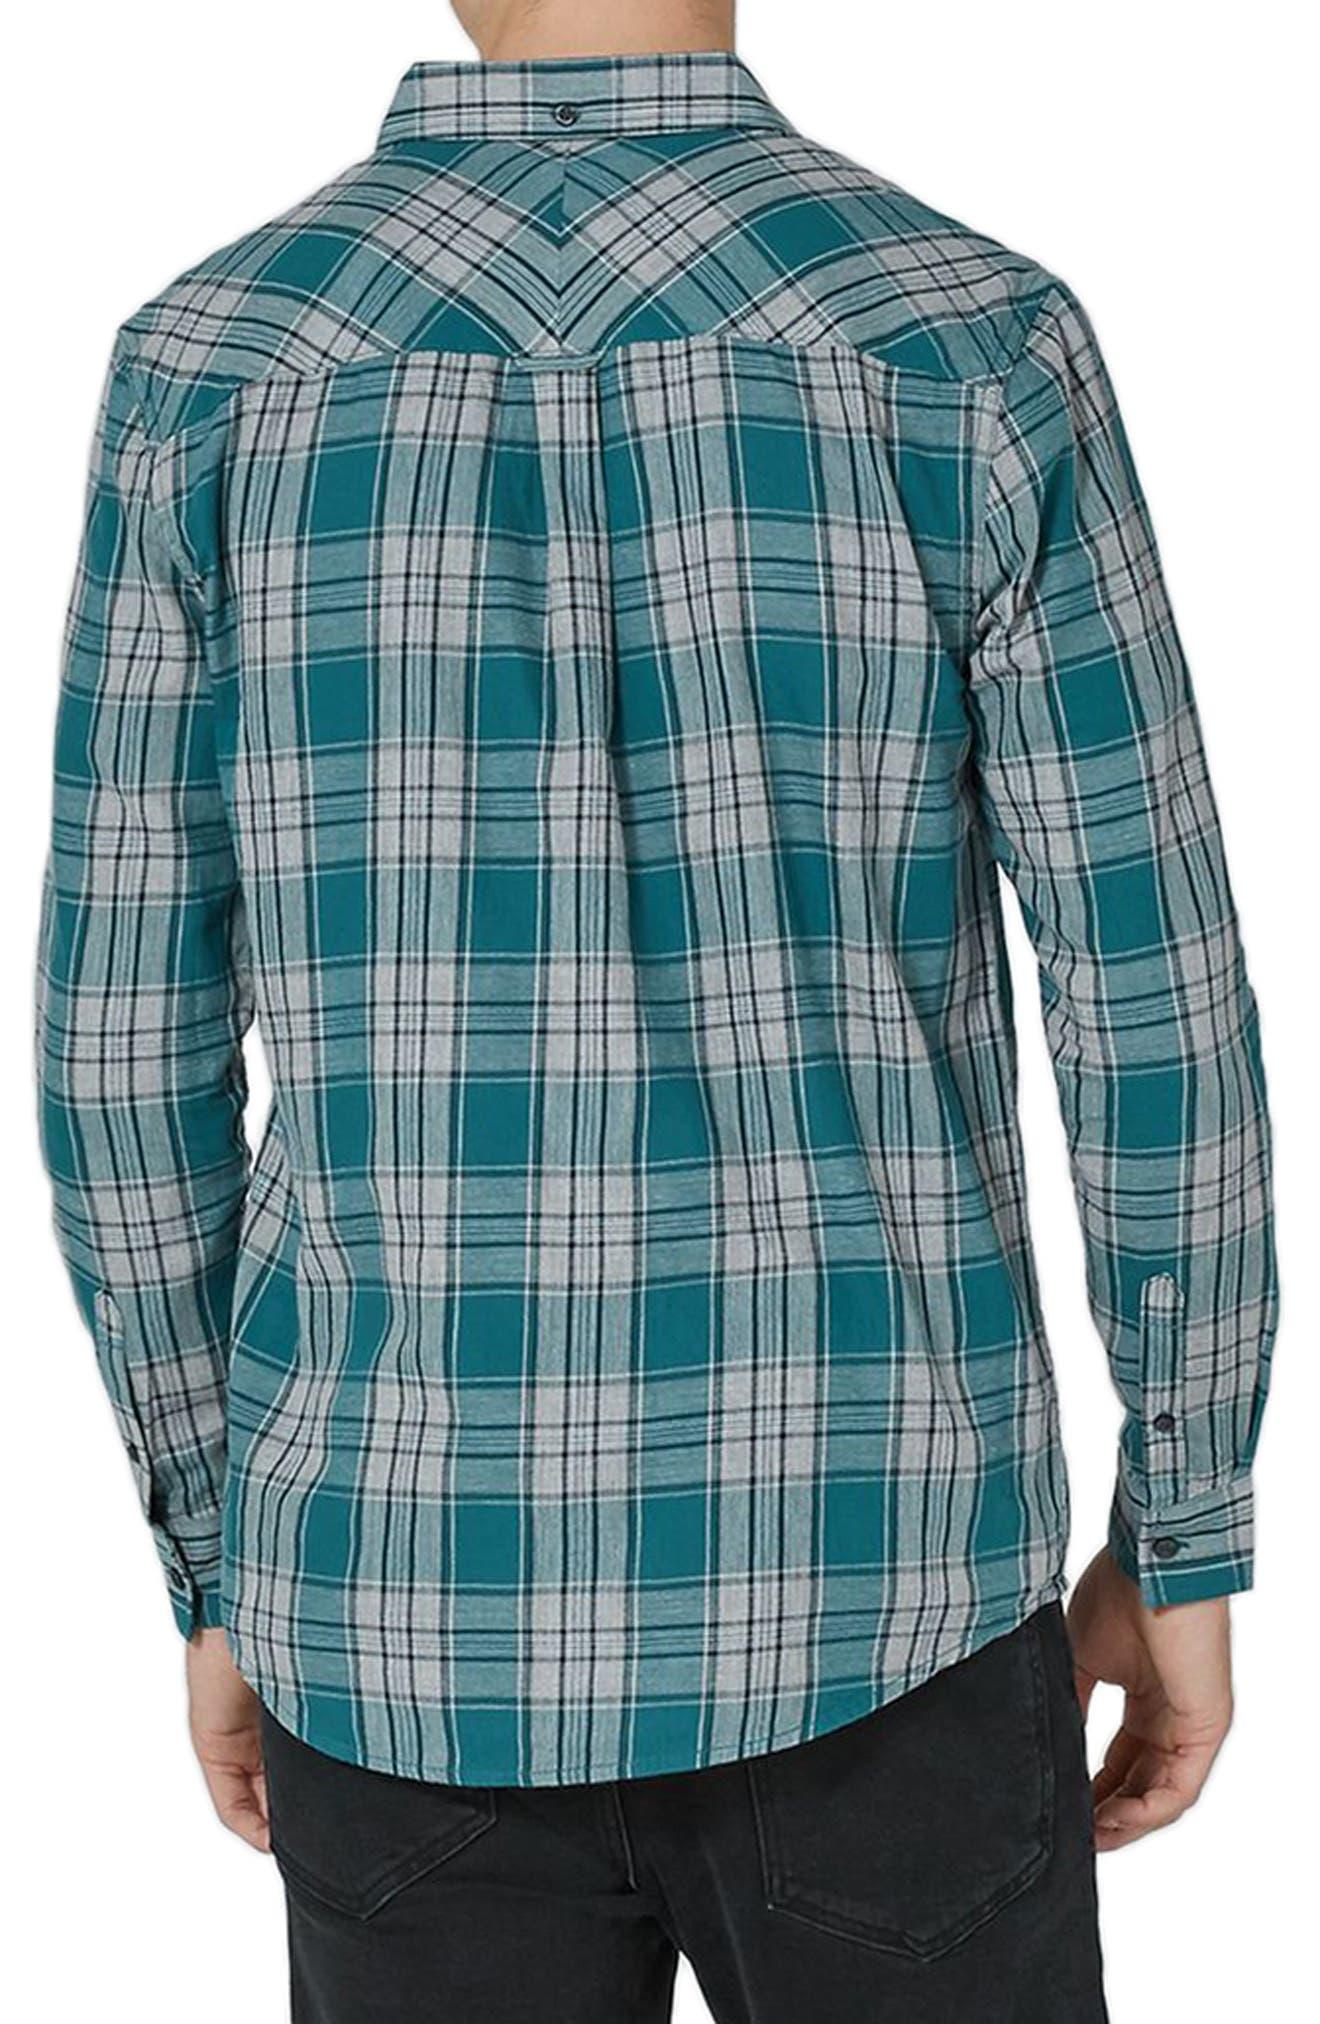 Charlie Check Shirt,                             Alternate thumbnail 2, color,                             400